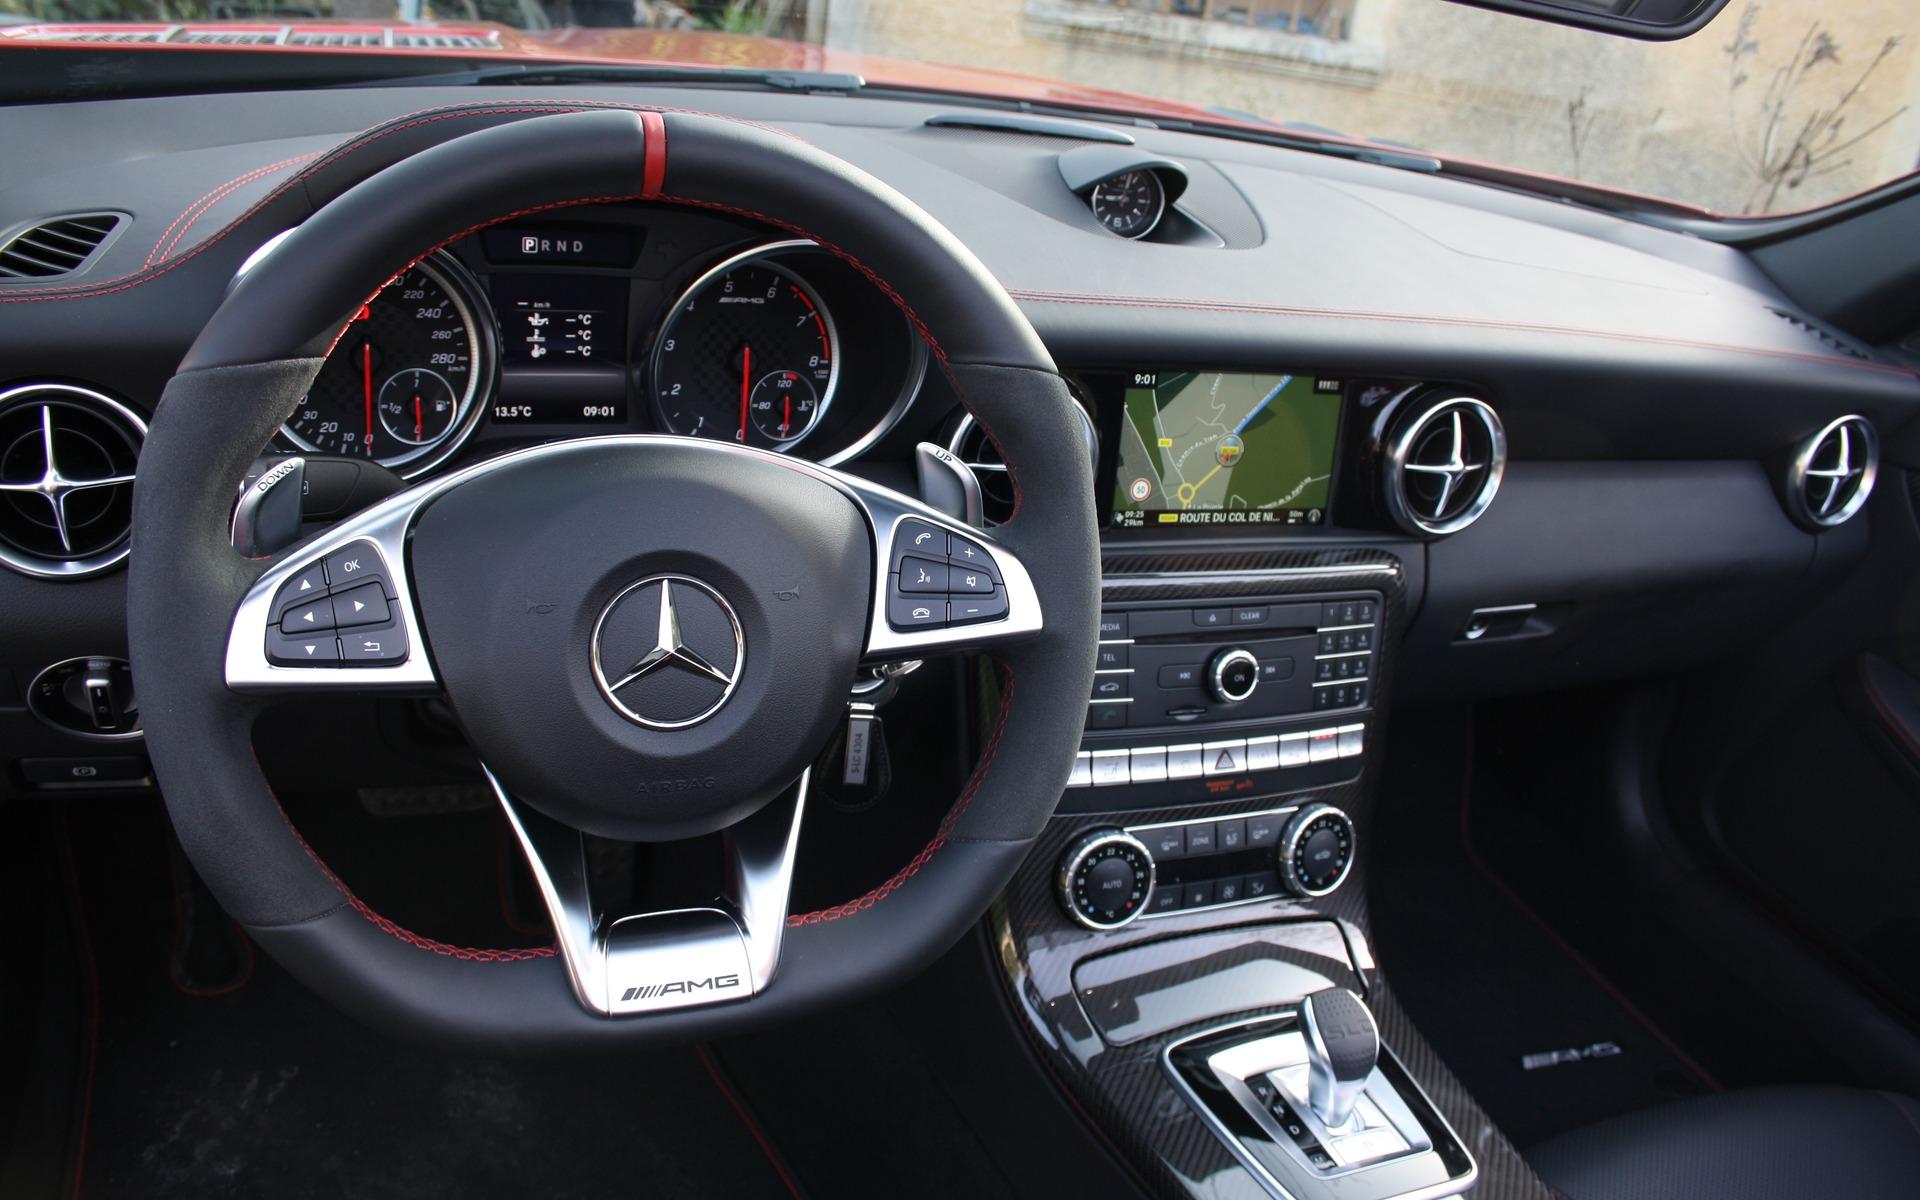 https://i.gaw.to/photos/2/4/5/245398_2017_Mercedes-Benz_SLC.jpg